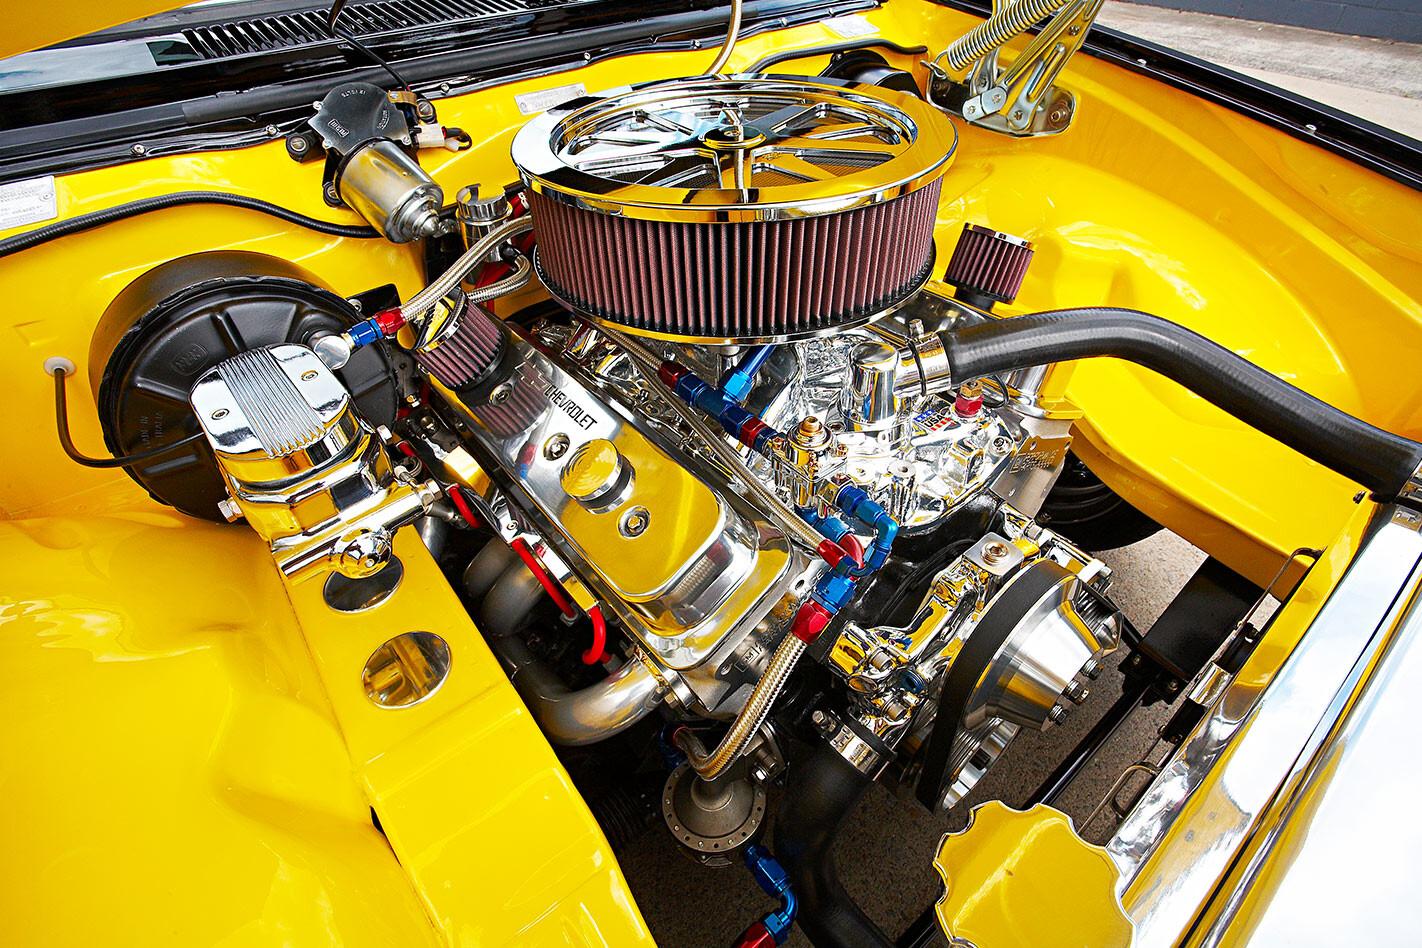 Holden Torana SS engine